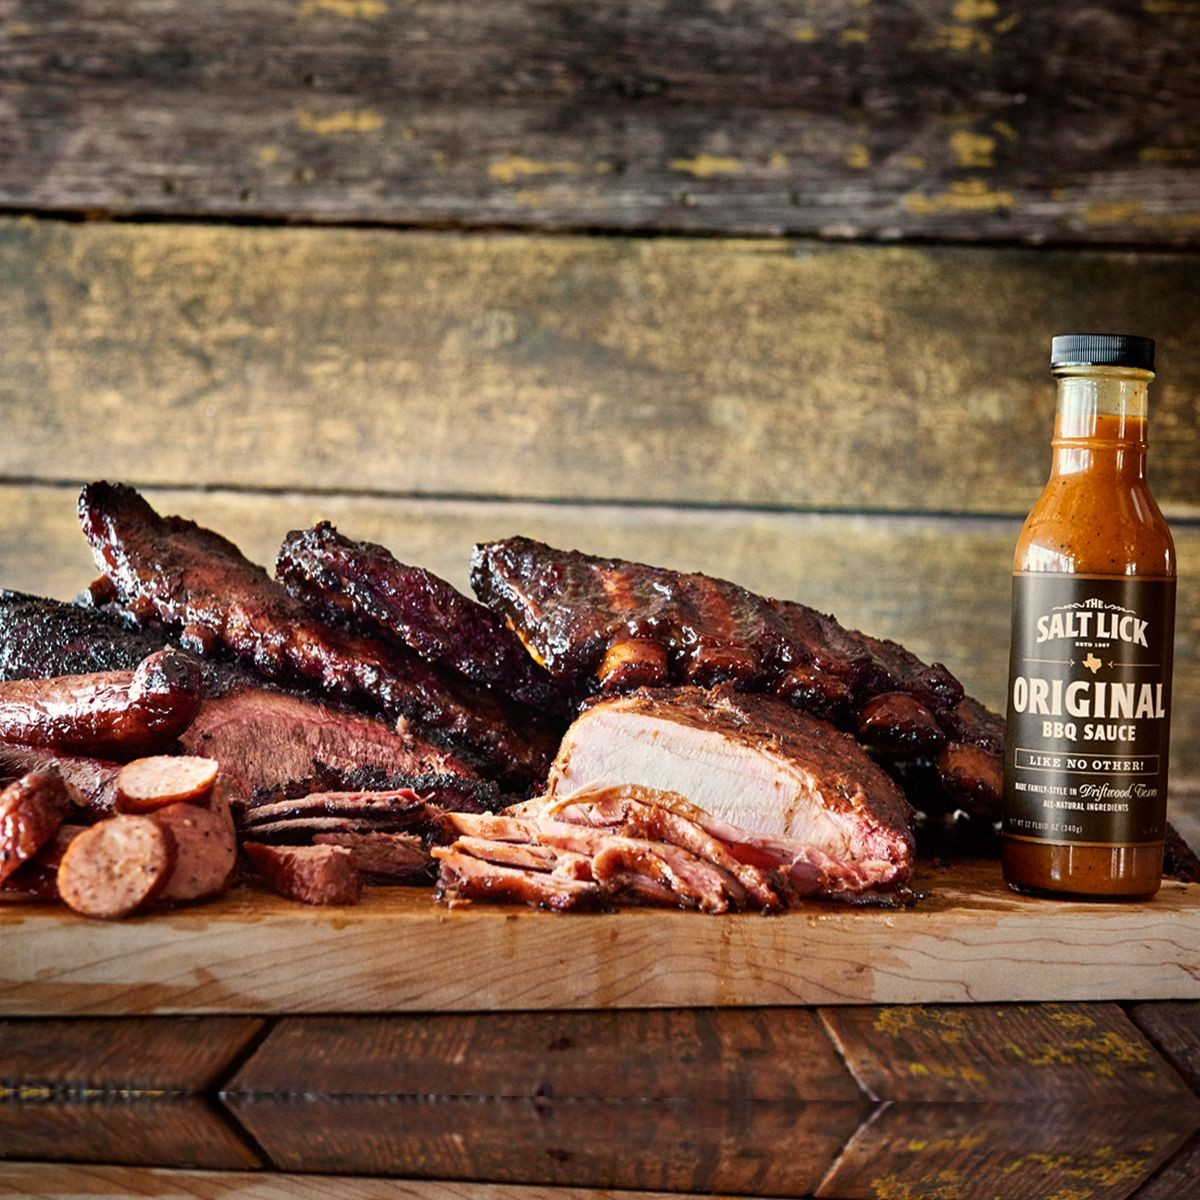 the-ranch-beef-ribs-brisket-smoked-turkey-pork-ribs-and-sausage.0c3d6c1c3ab739b6d1ceecb2b894b64a